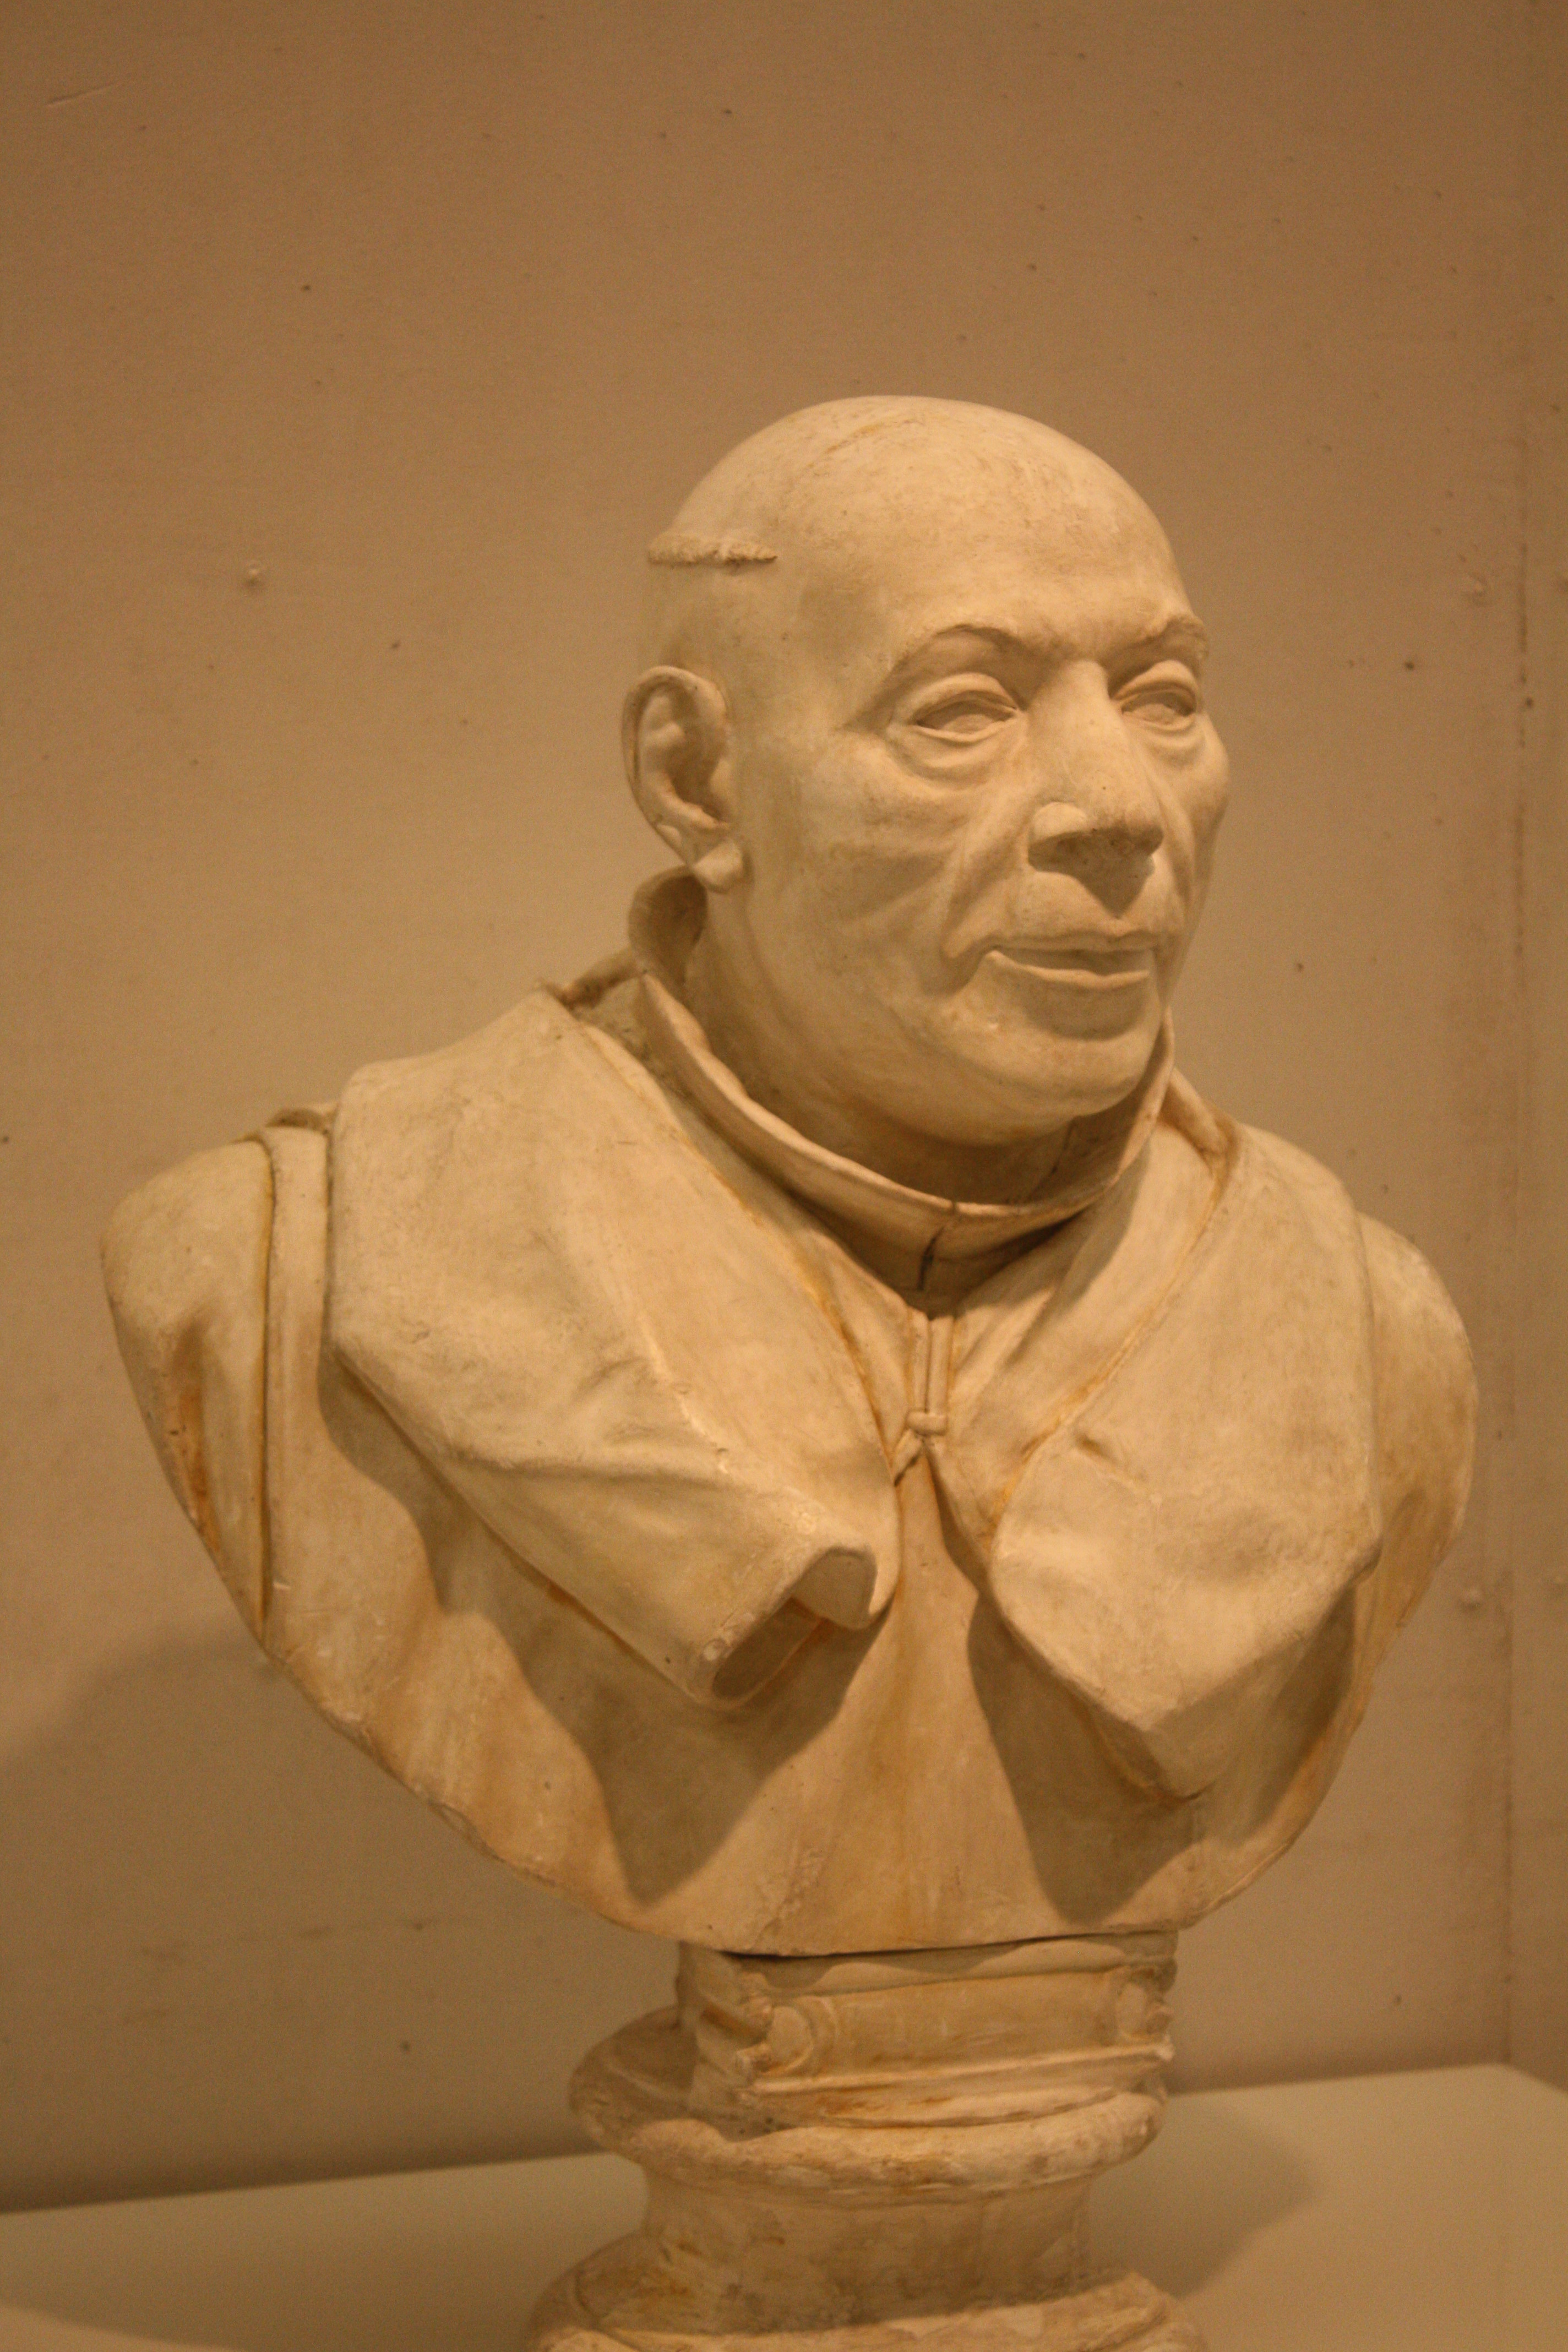 File:Museo Pontevedra, 6 Edificio, 02-12 Sarmiento.JPG - Wikimedia Commons